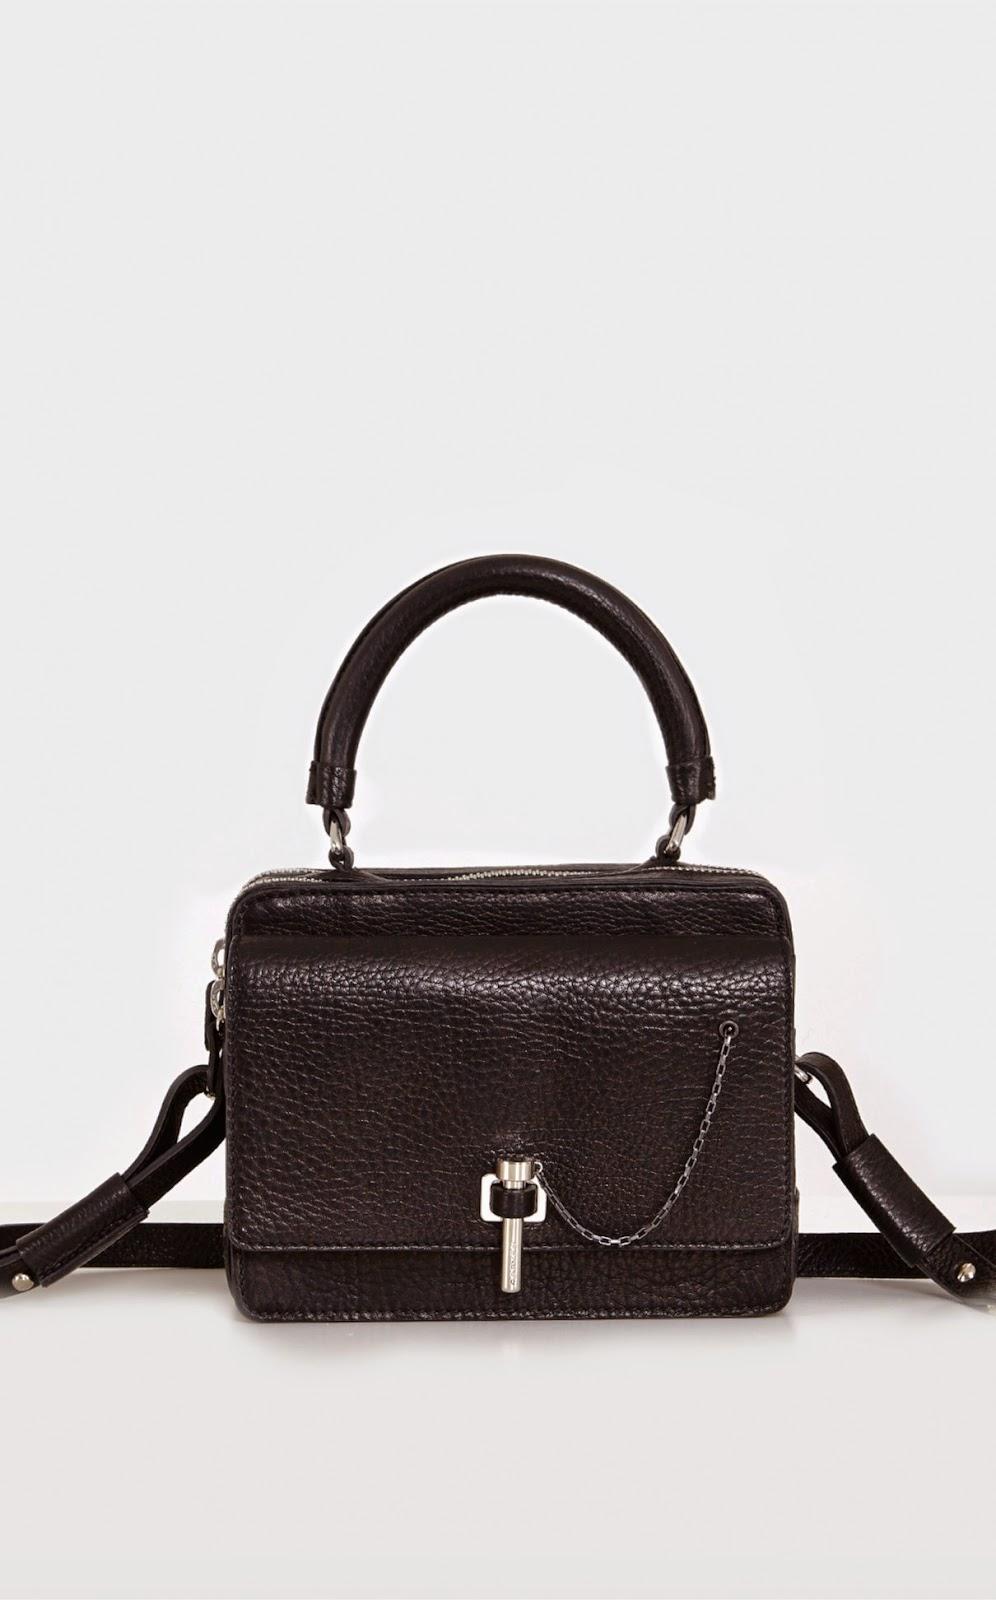 Eniwhere Fashion - Carven bags